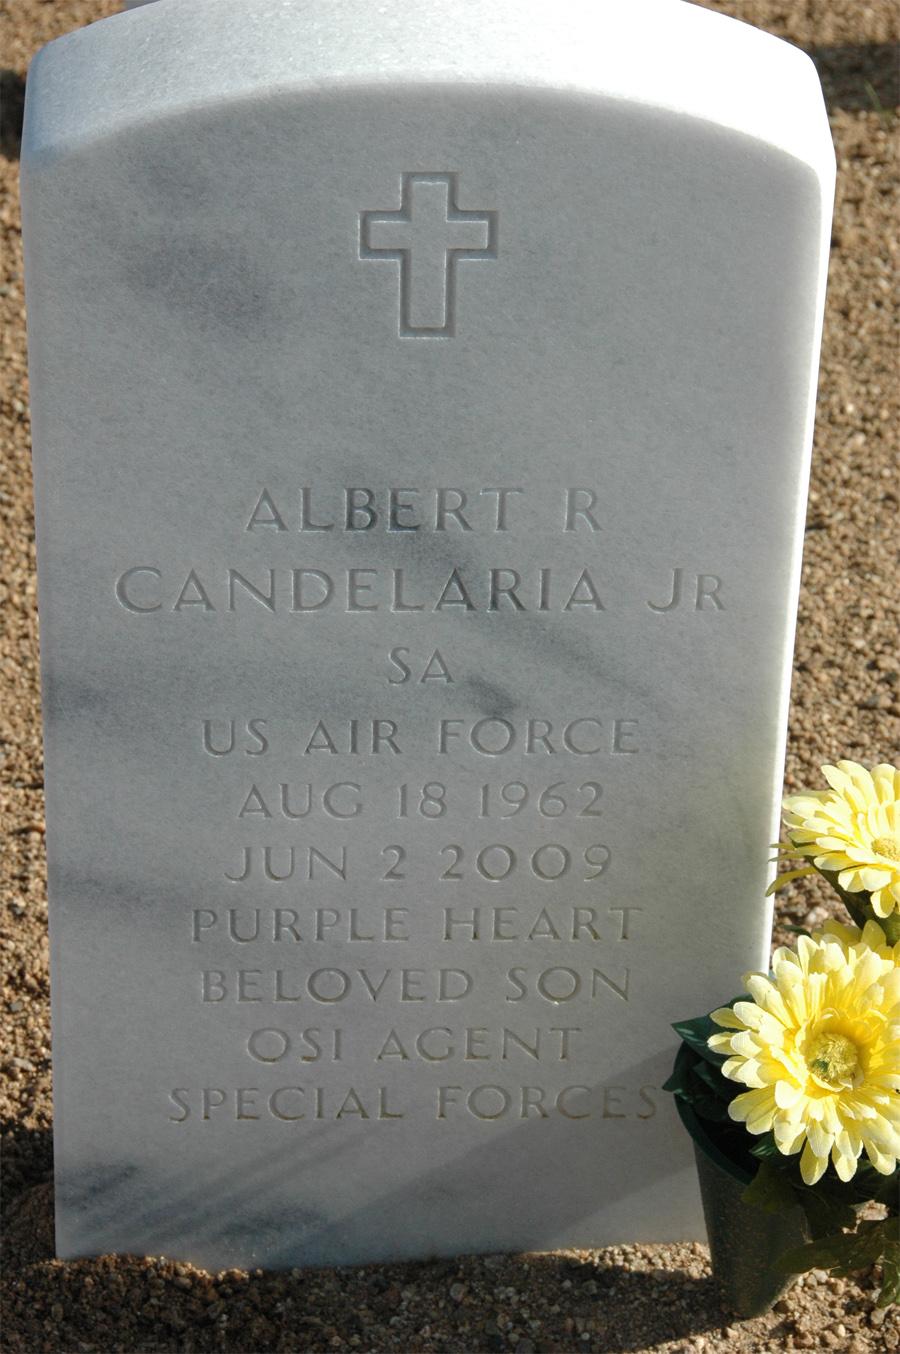 Albert R Candelaria, Jr